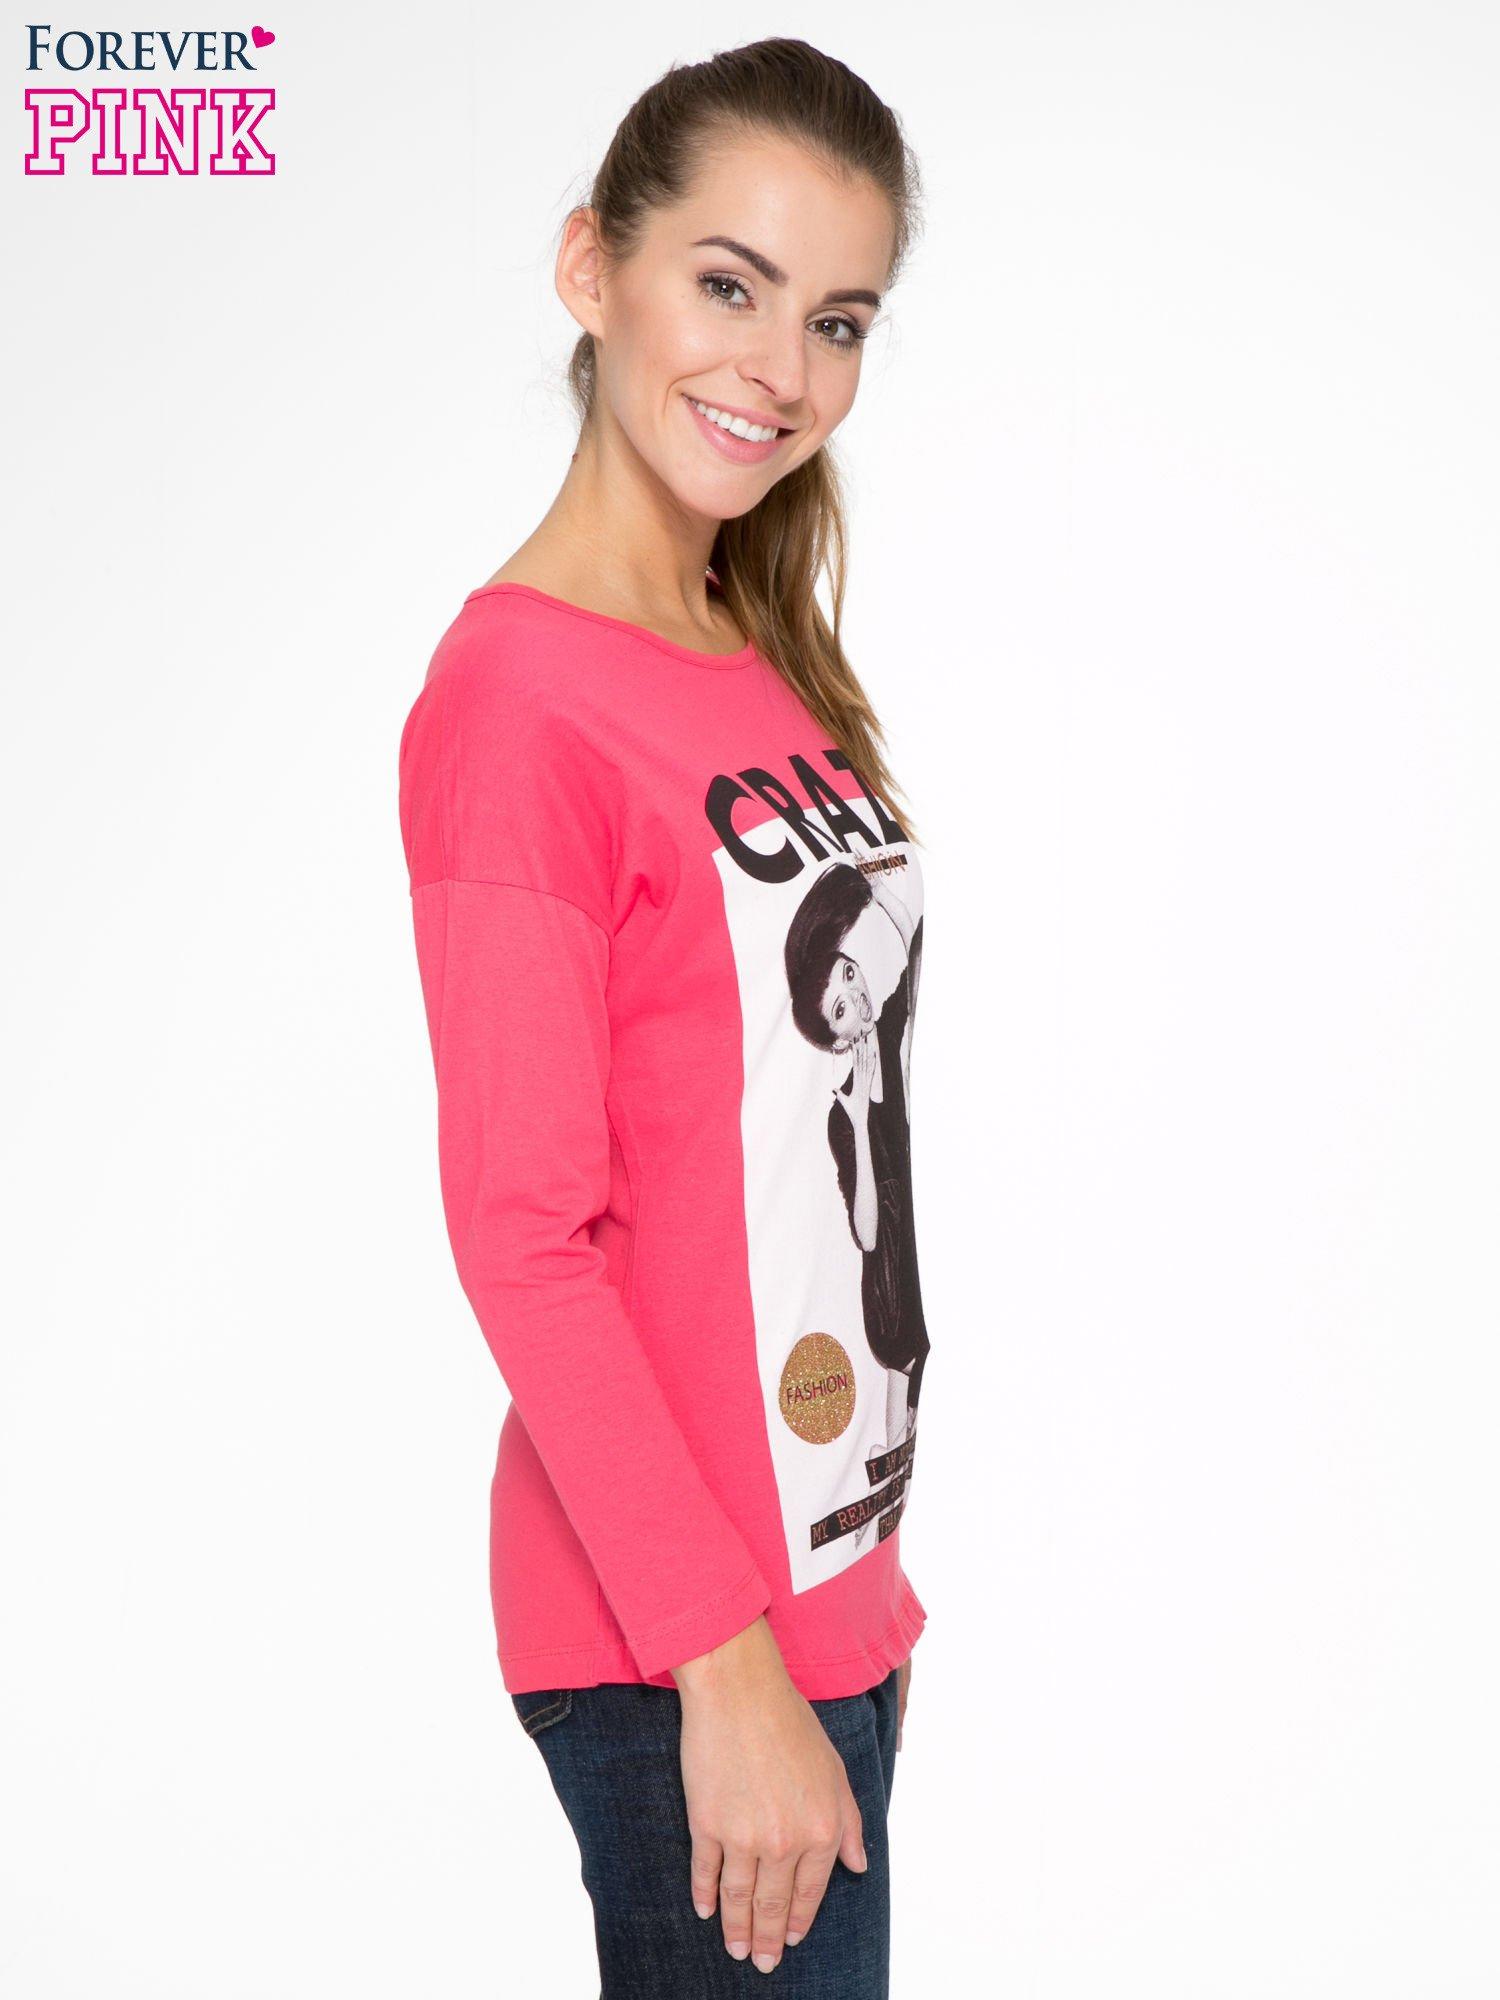 Koralowa bluzka z napisem CRAZY i nadrukiem fashionistek                                  zdj.                                  3